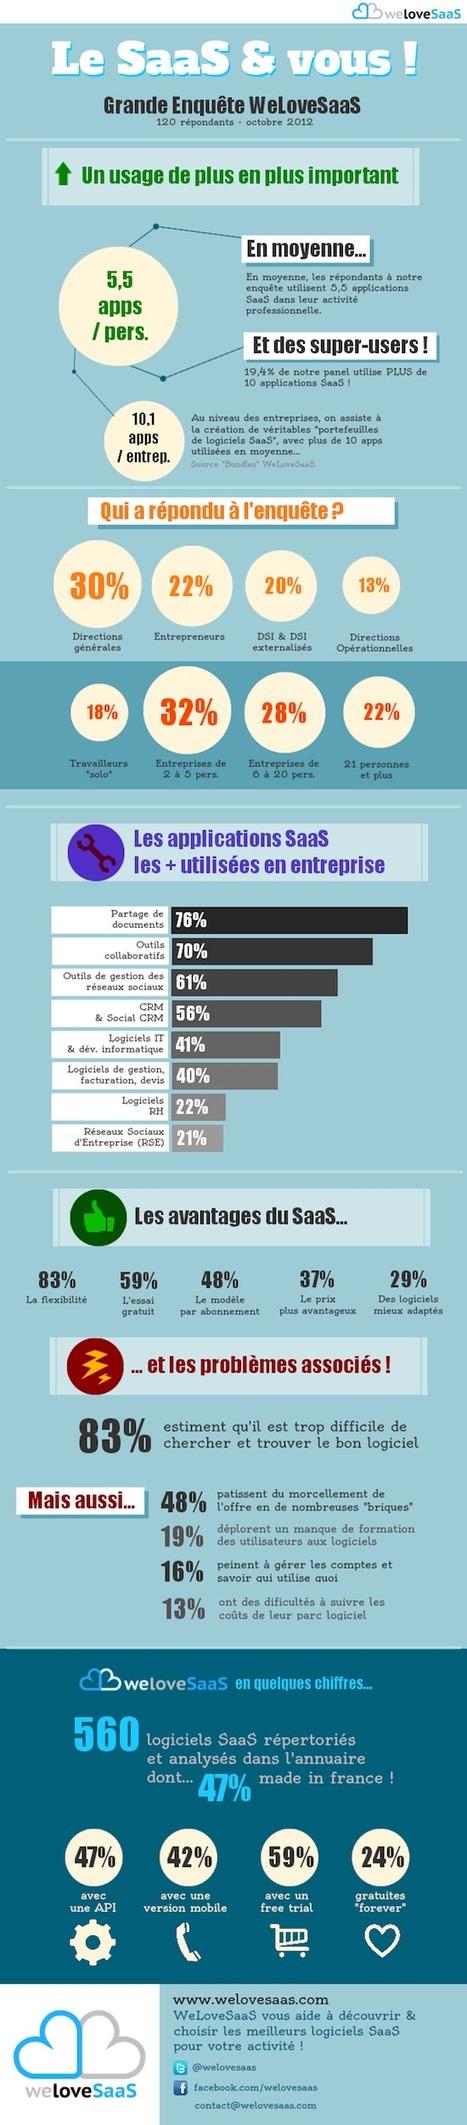 [Infographie] L'utilisation des applications SaaS en entreprise   Beyond Marketing   Scoop.it